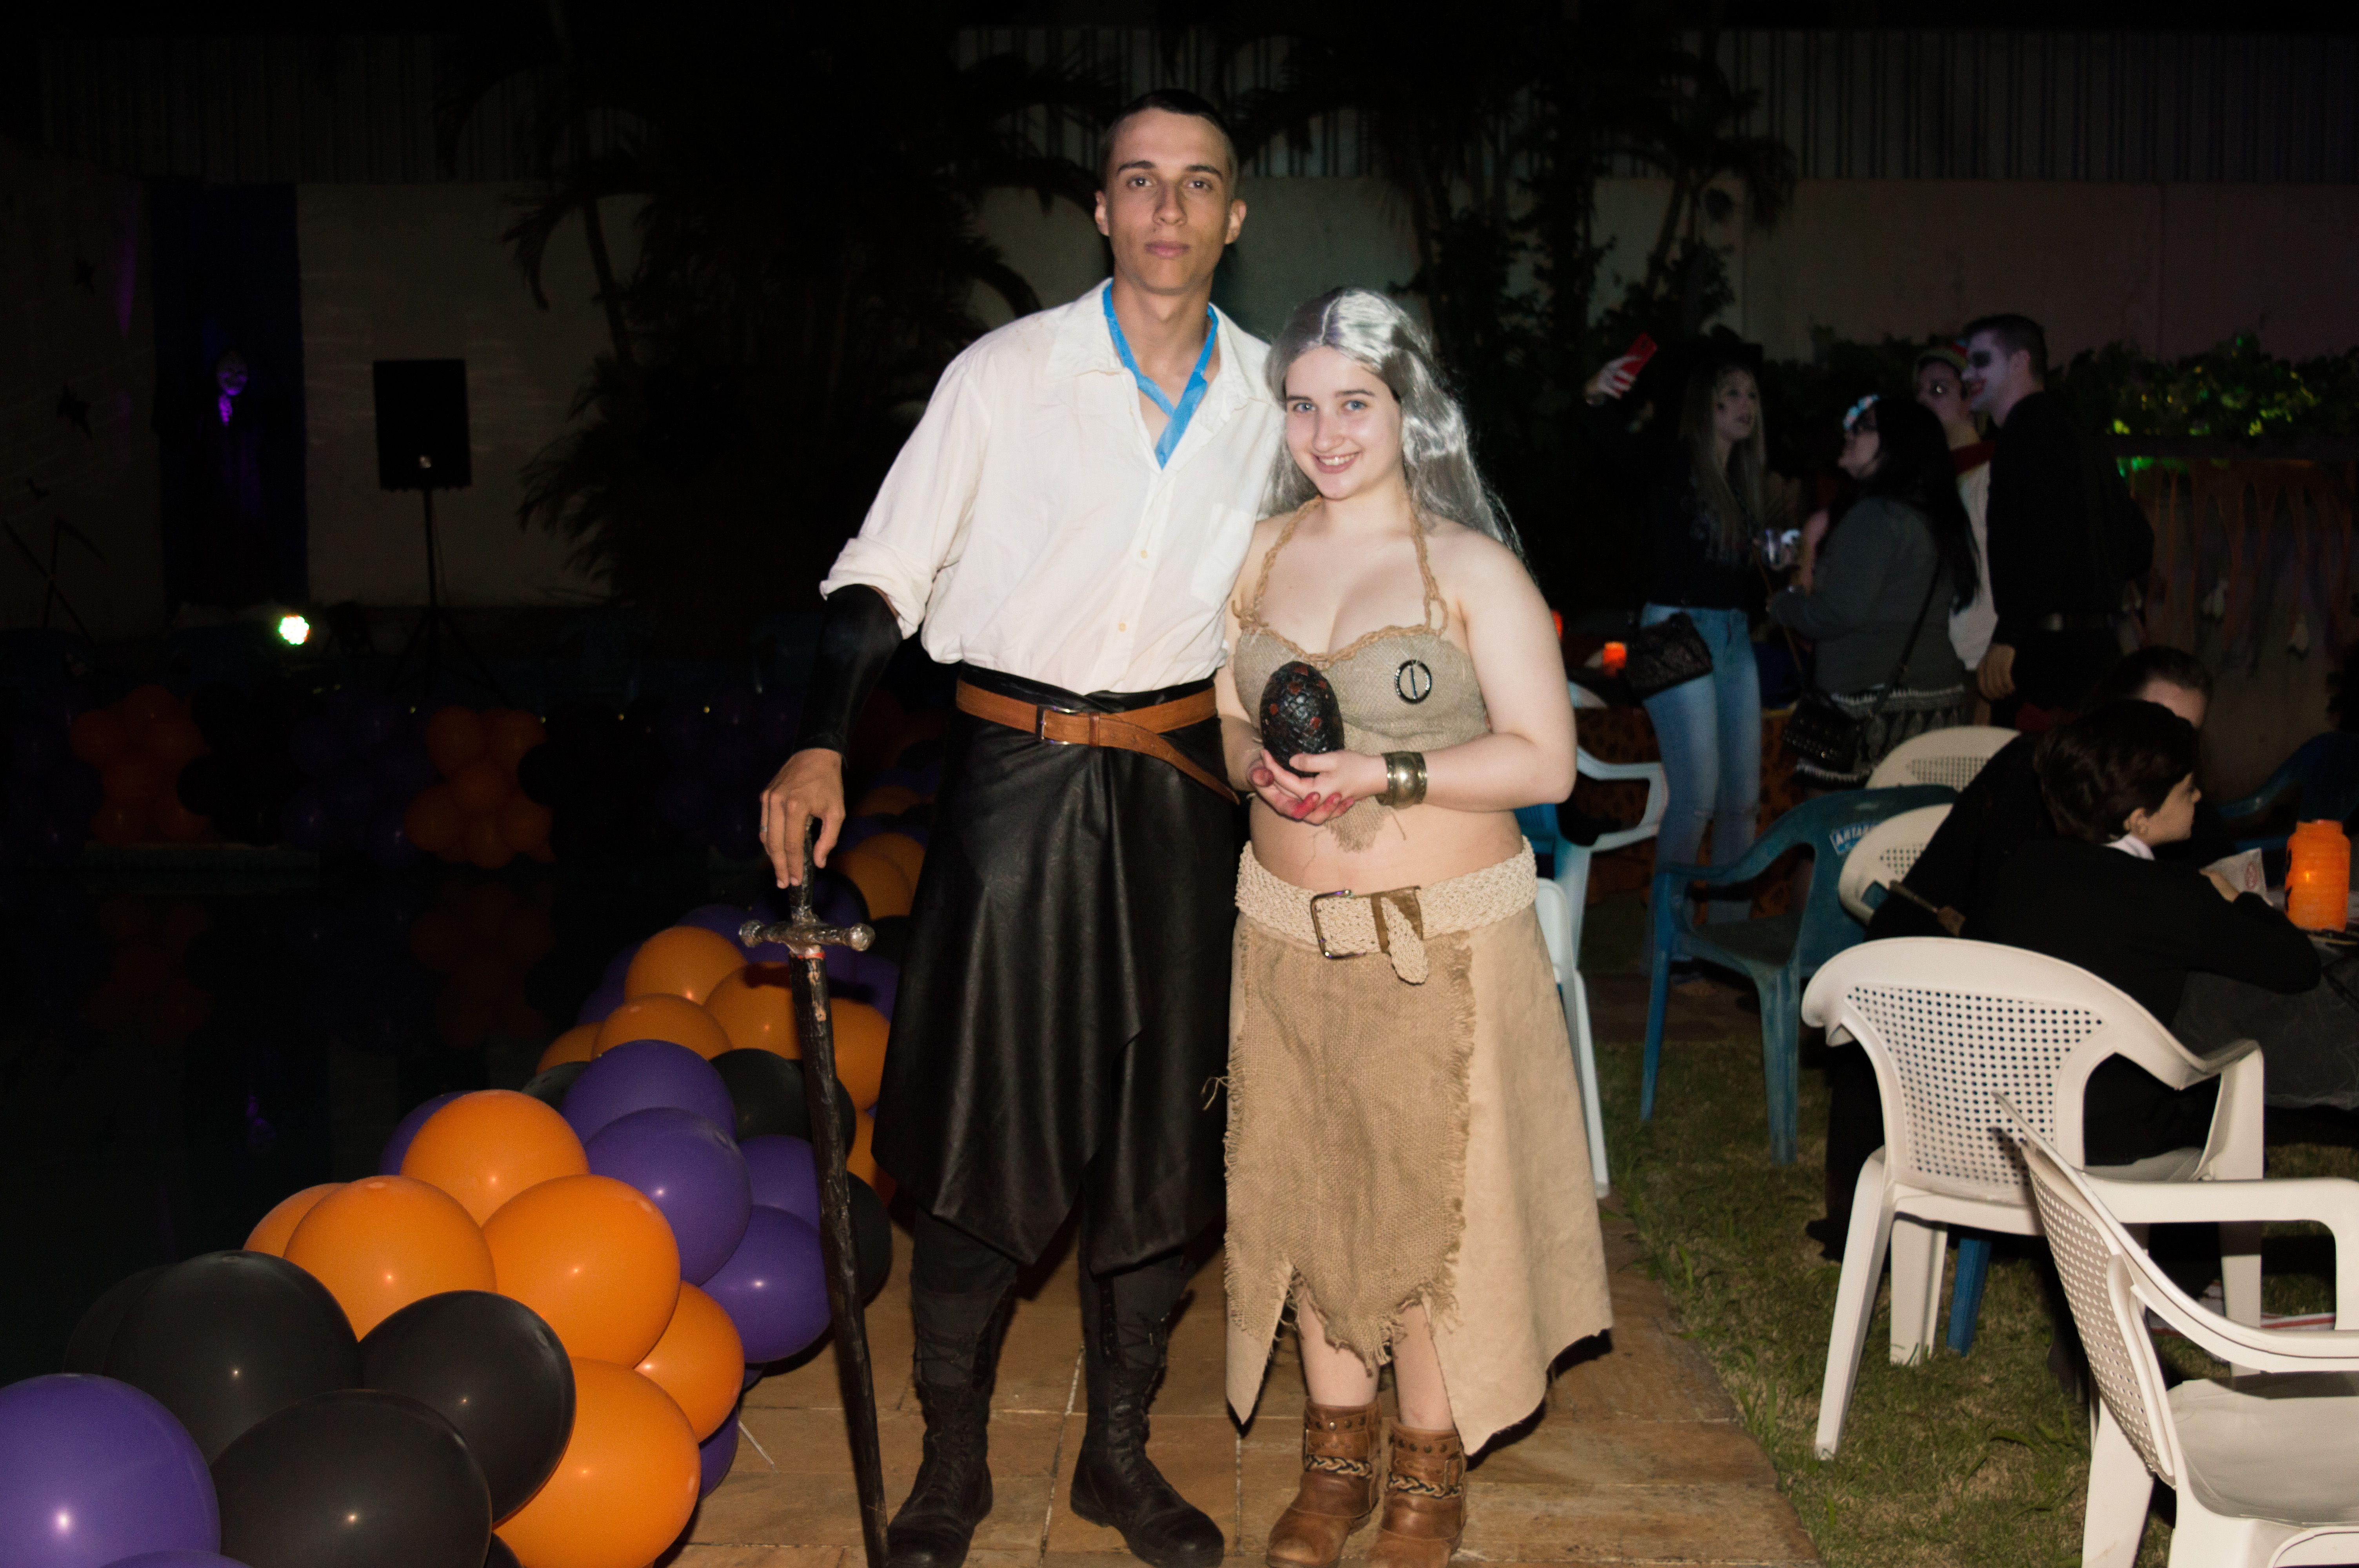 Fisk Cachoeira do Sul/ RS - Halloween